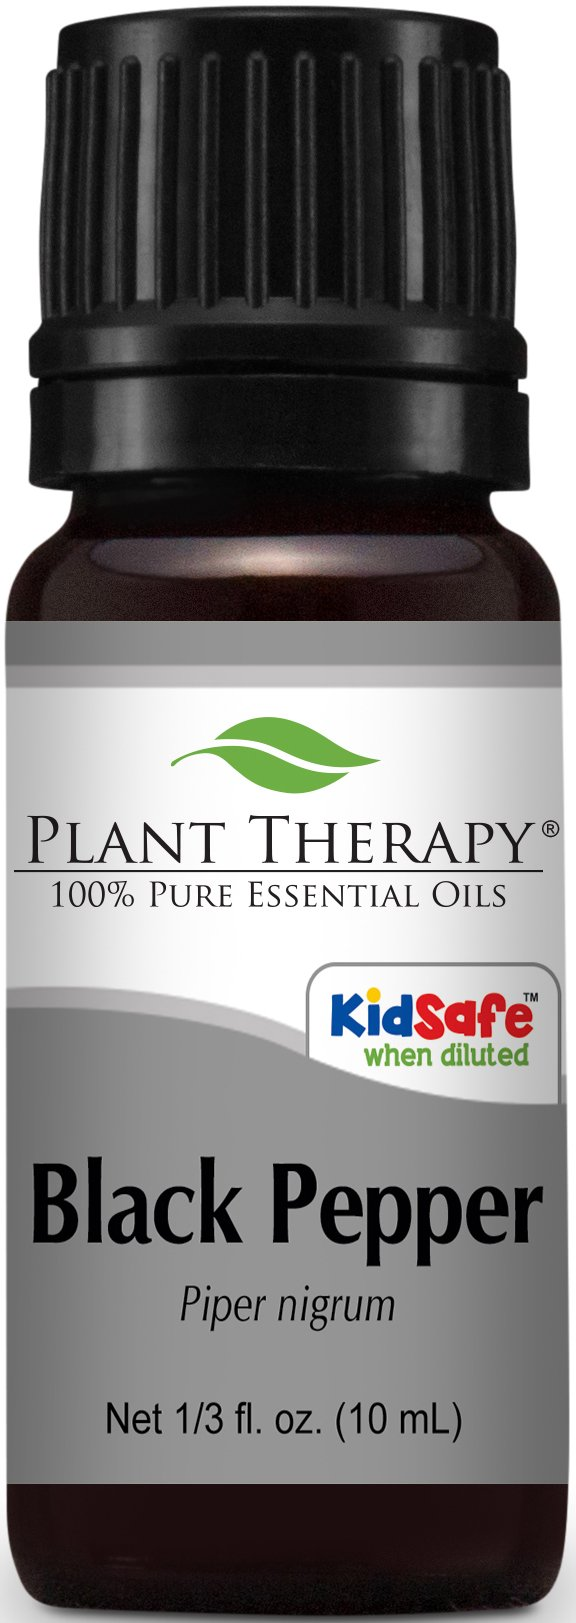 Plant Therapy Black Pepper Essential Oil. 100% Pure, Undiluted, Therapeutic Grade. 10 ml (1/3 oz).